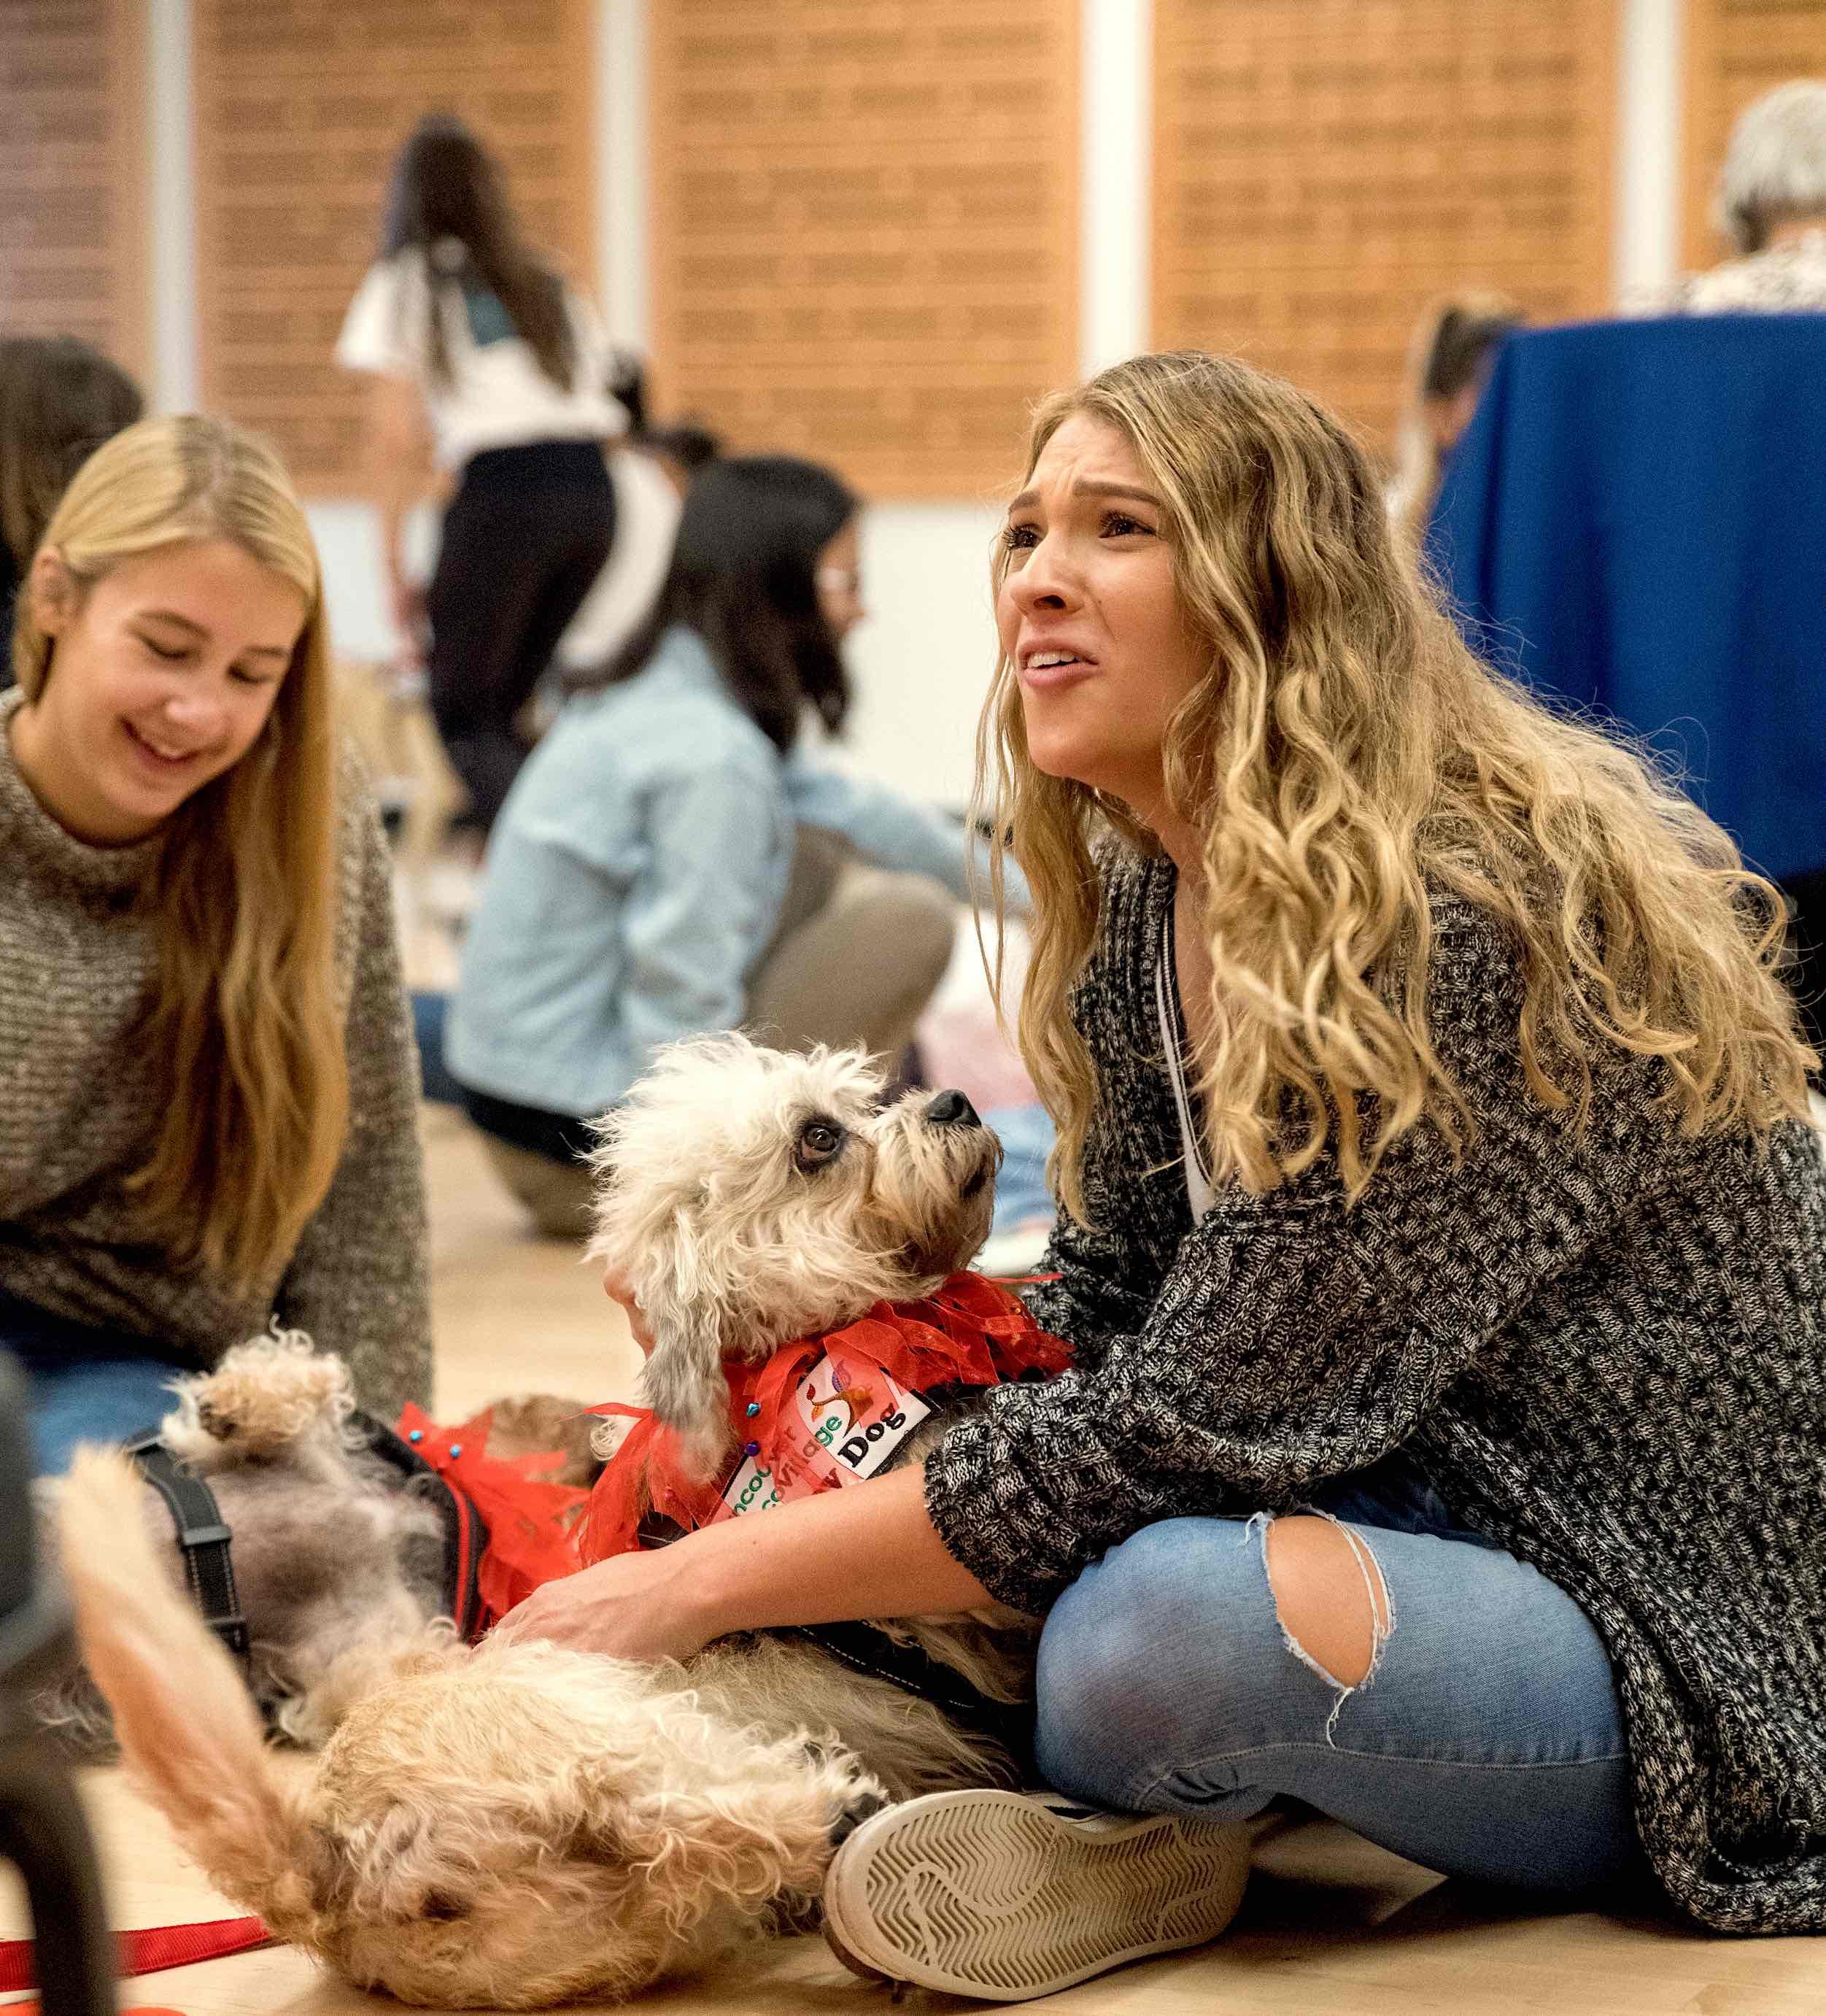 Dandie Dinmont Terrier LUCY